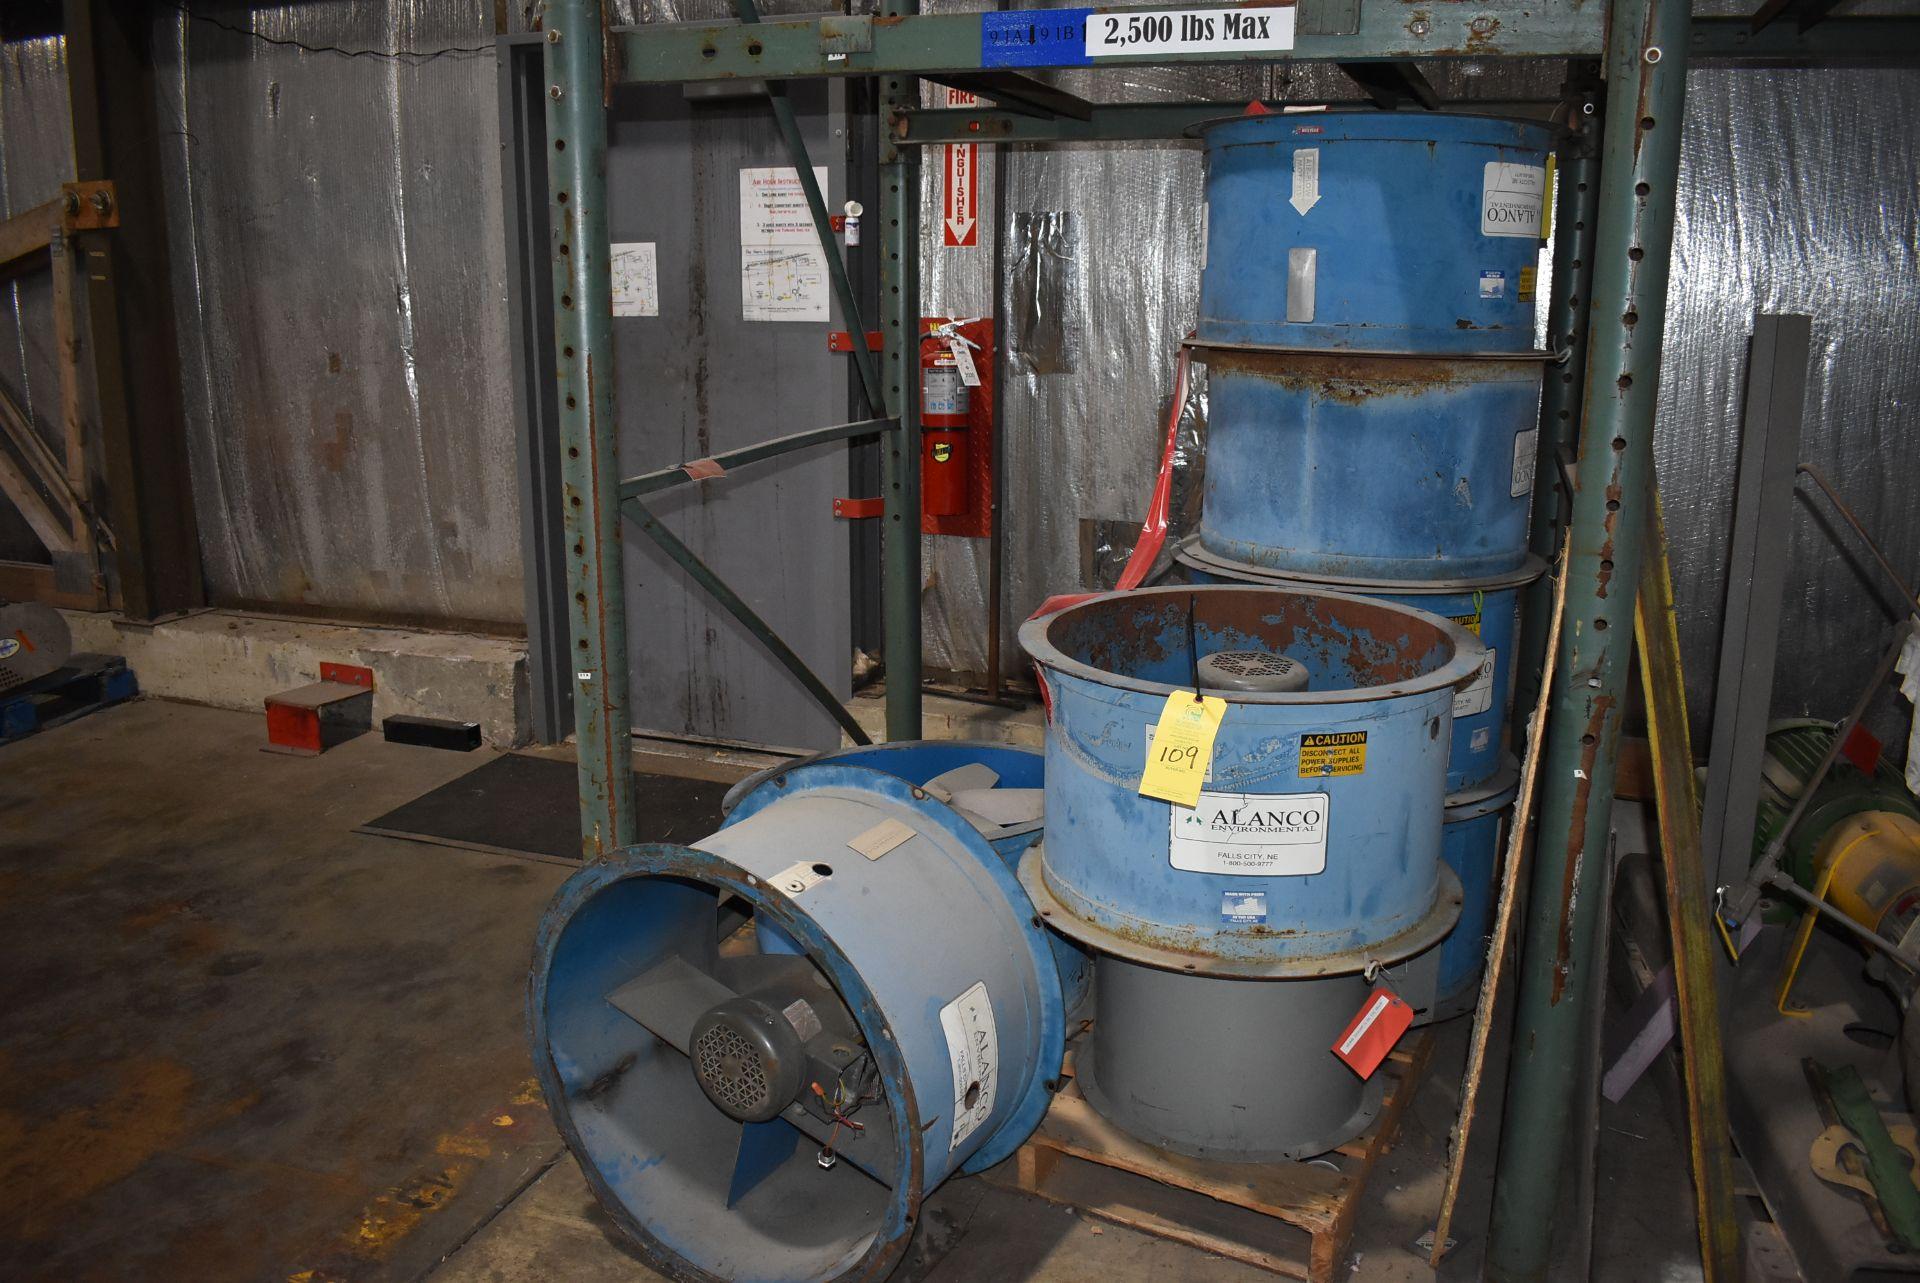 "Qty. (7) Alanco Environmental 24"" Fans w/2 HP Motors, Qty. (1) Dayton #4C66 Fan w/ 1/2 HP Motor"